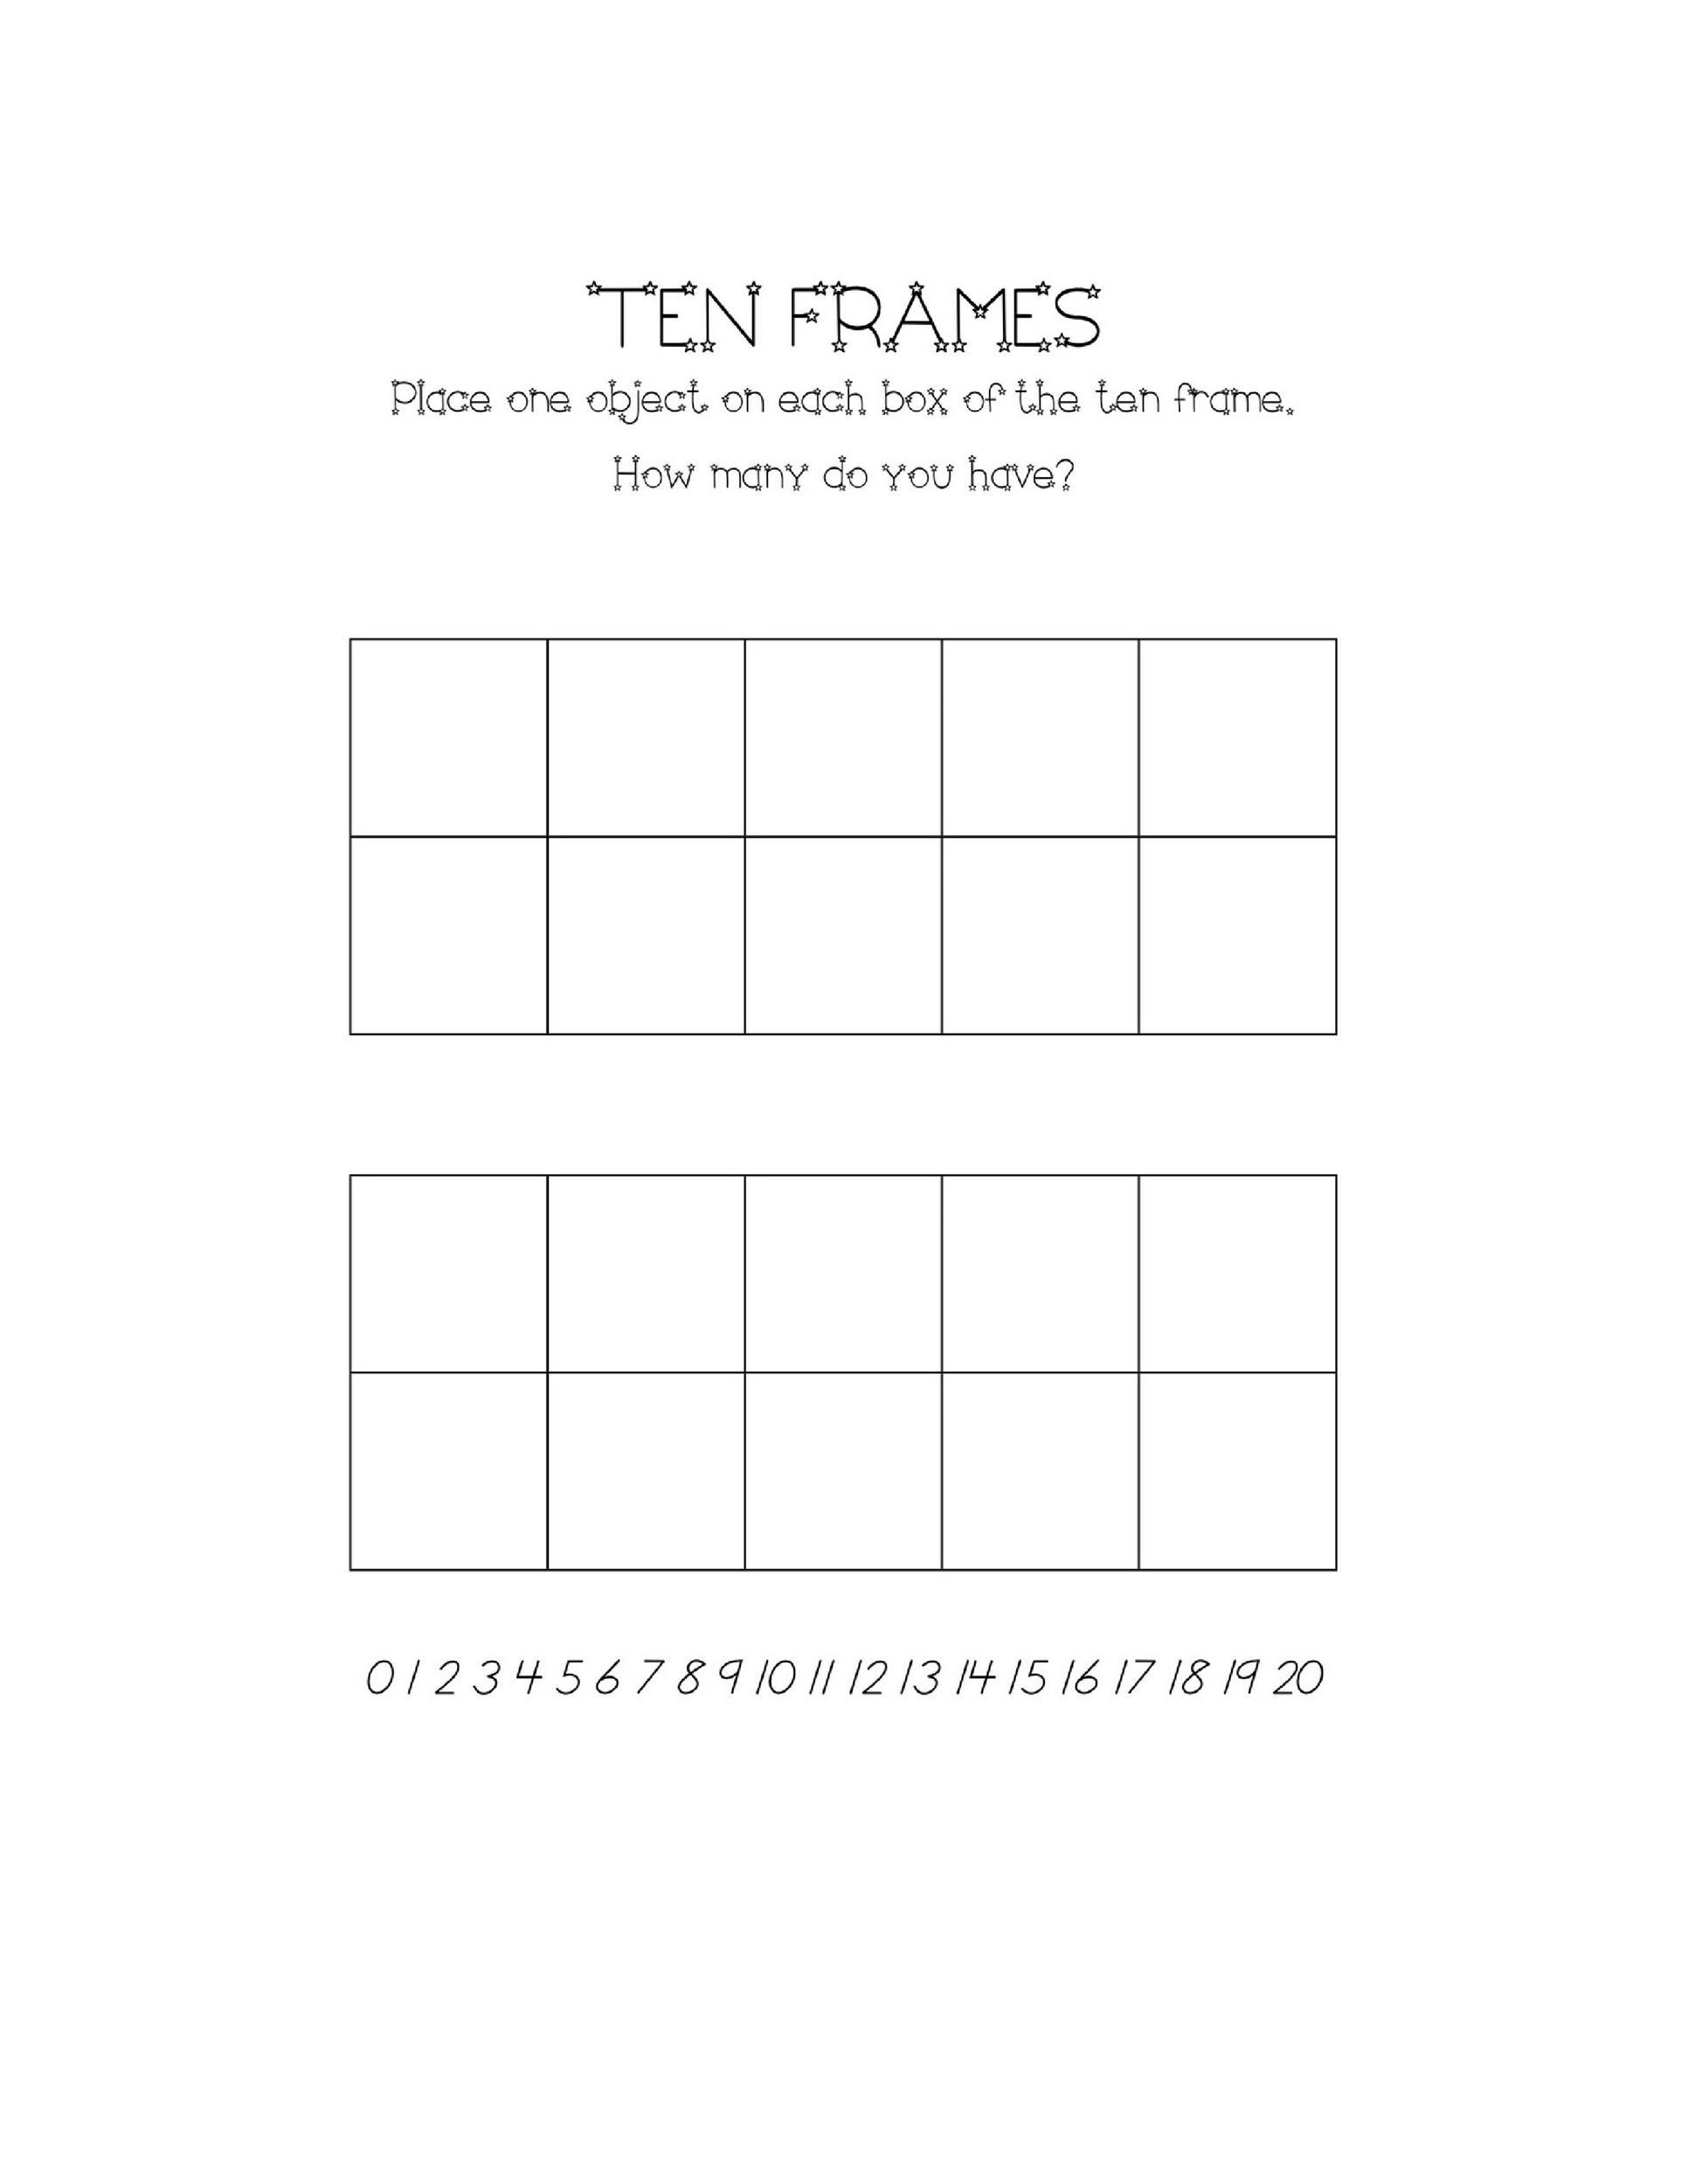 36 Printable Ten Frame Templates (Free) ᐅ Template Lab